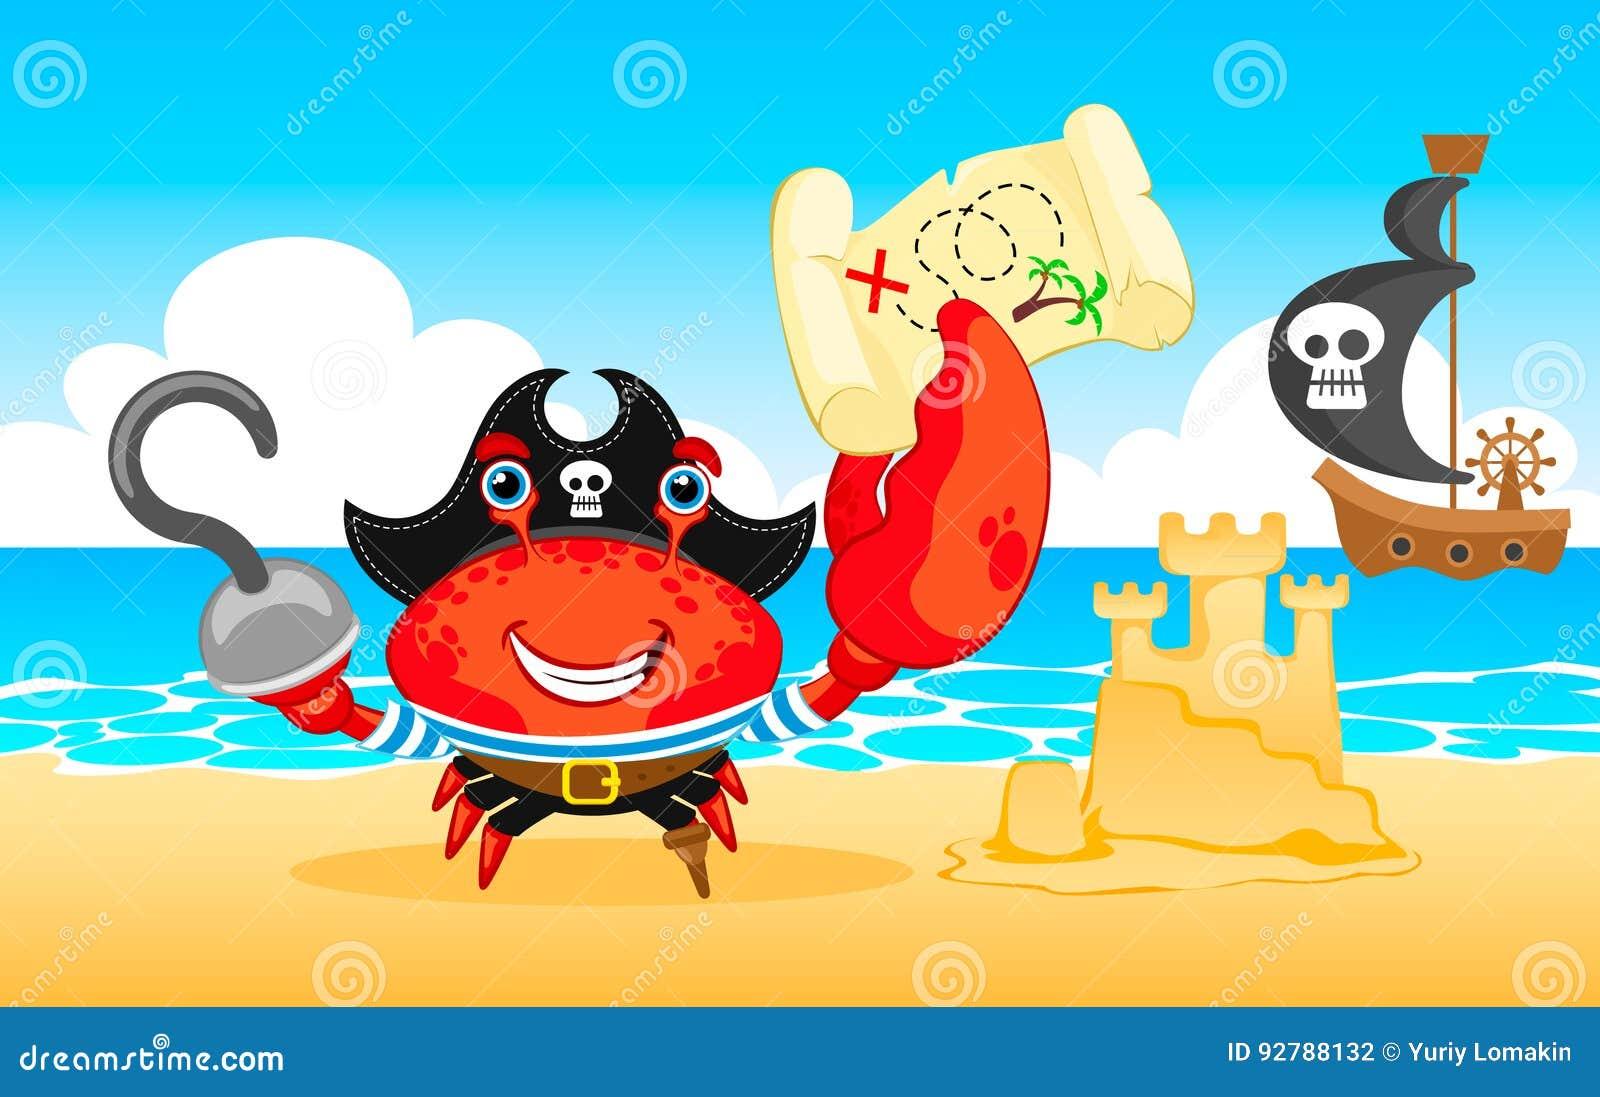 vector illustration pirate crab stock vector illustration of comic